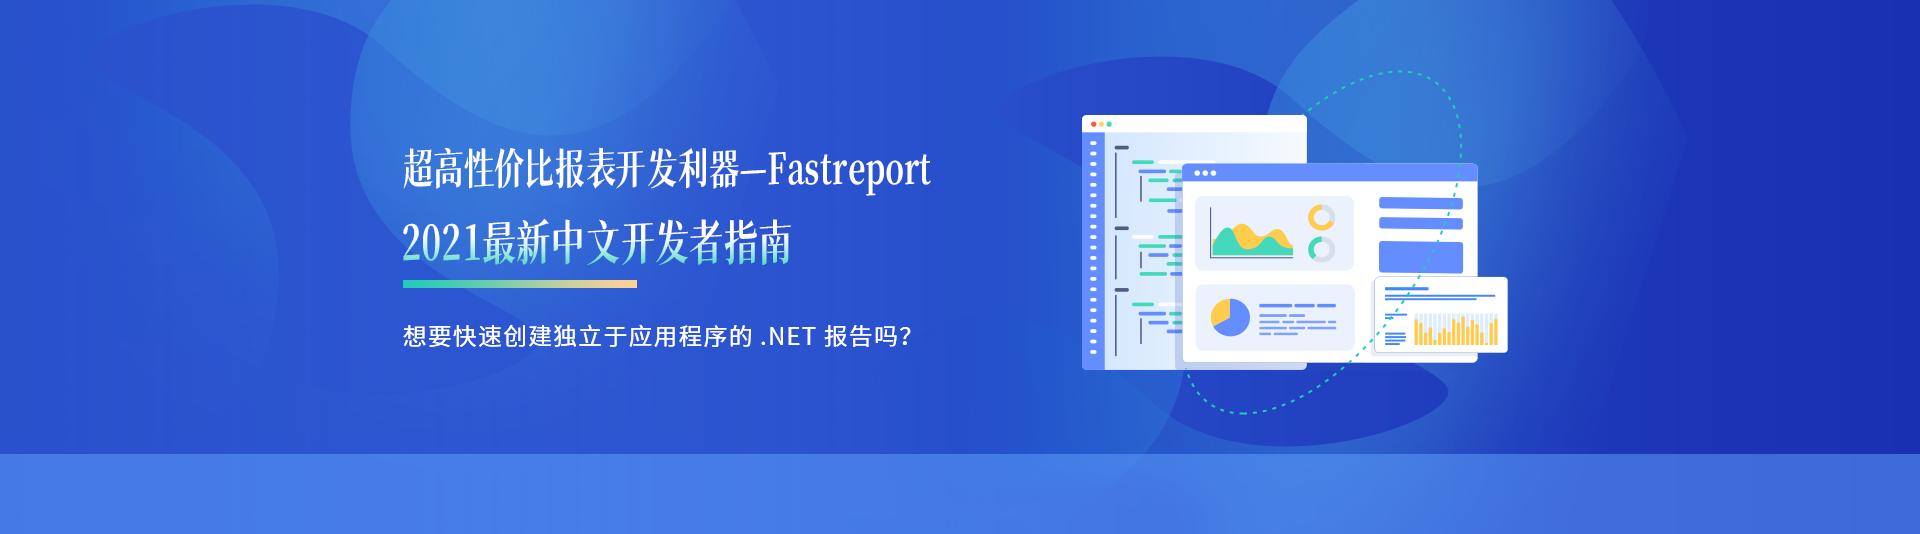 FastReport 2021最新中文开发者指南倾情放送